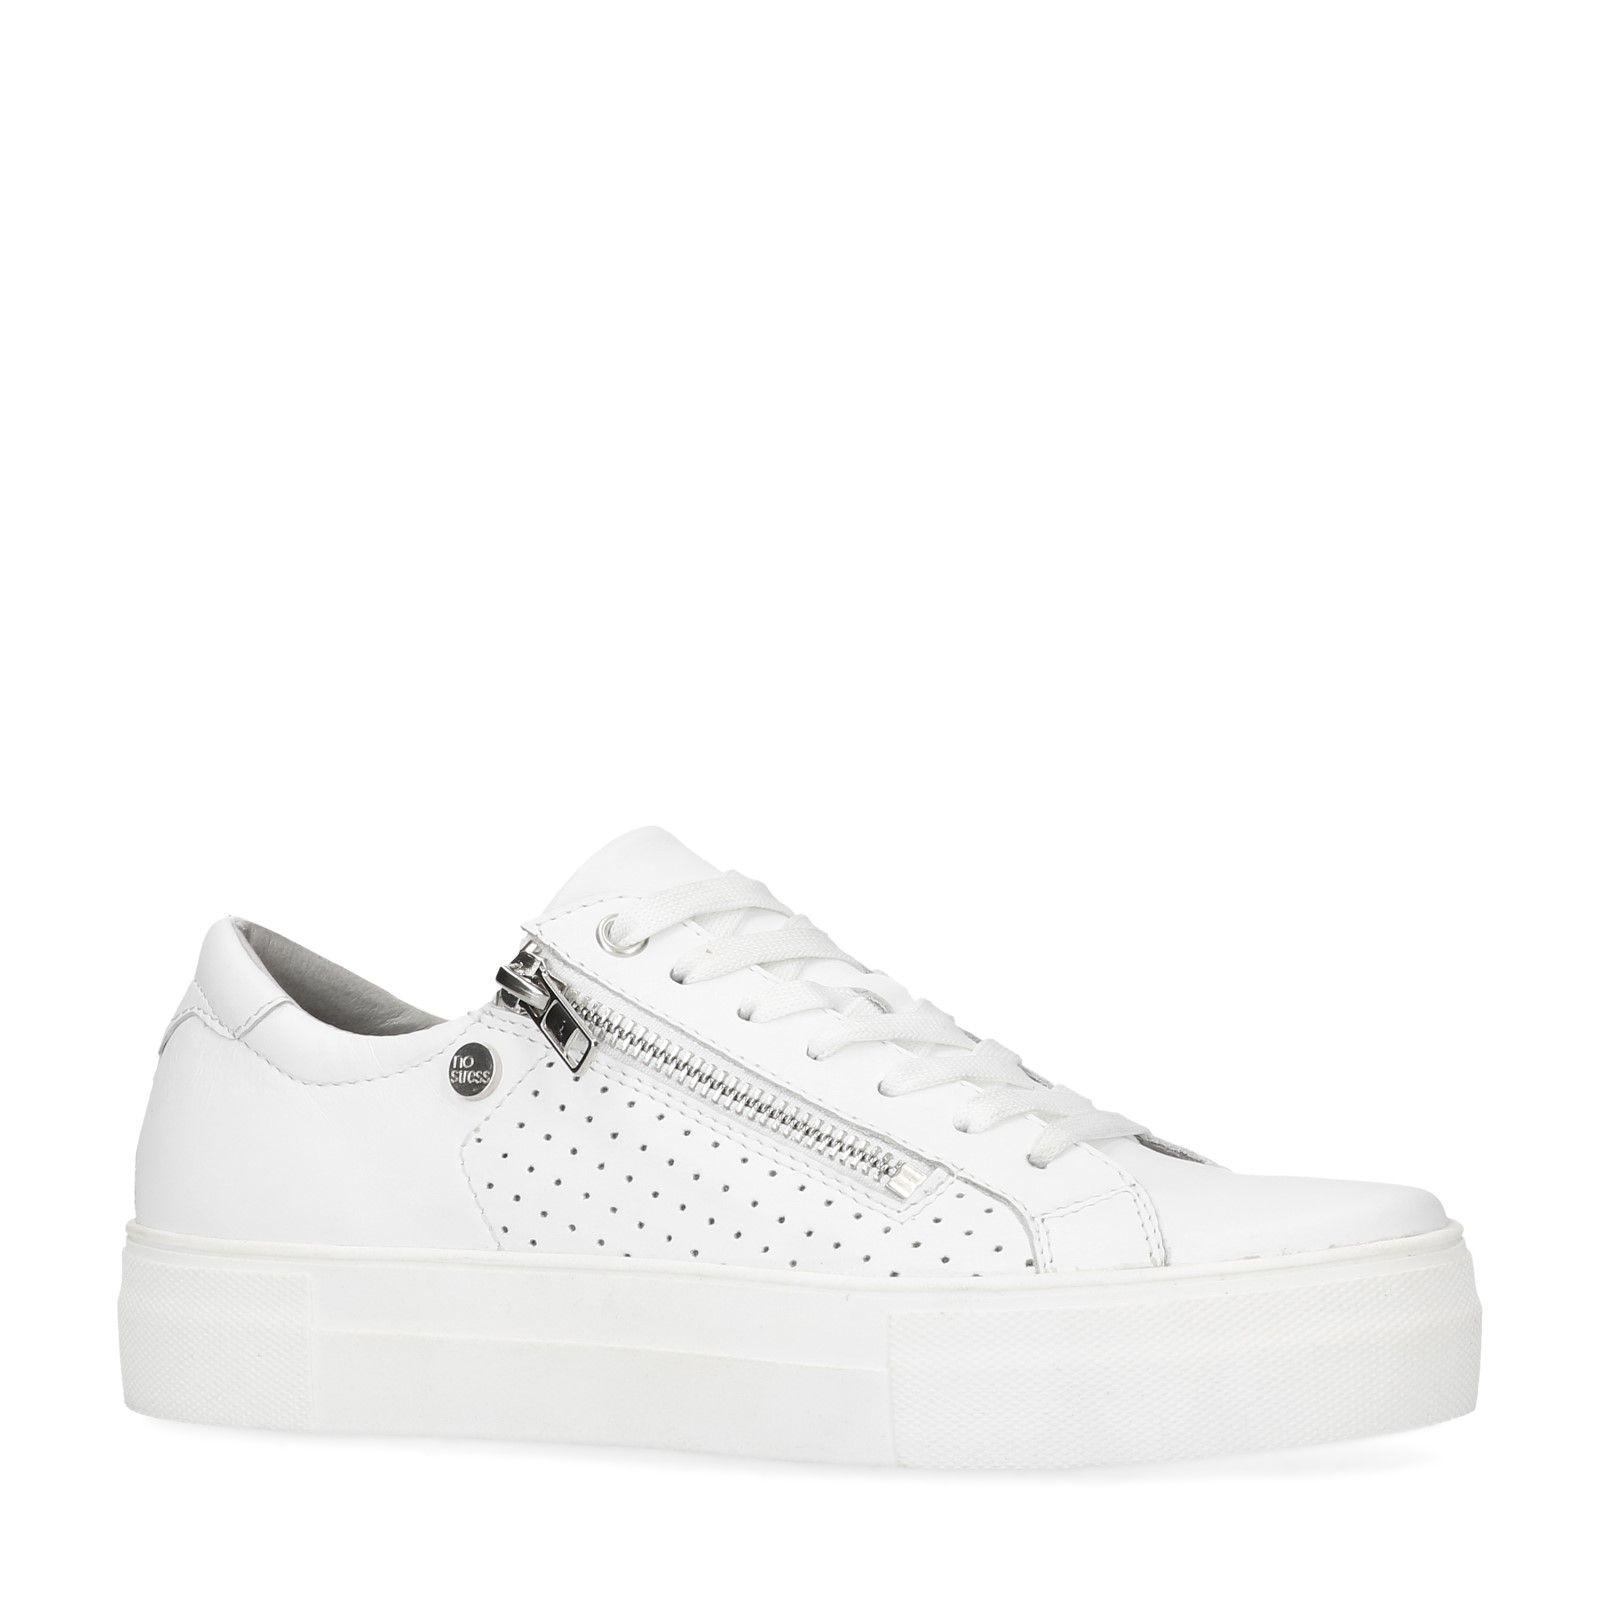 6c8805596a660d No Stress Weiße Sneaker mit Reißverschluss. - 20%. prev